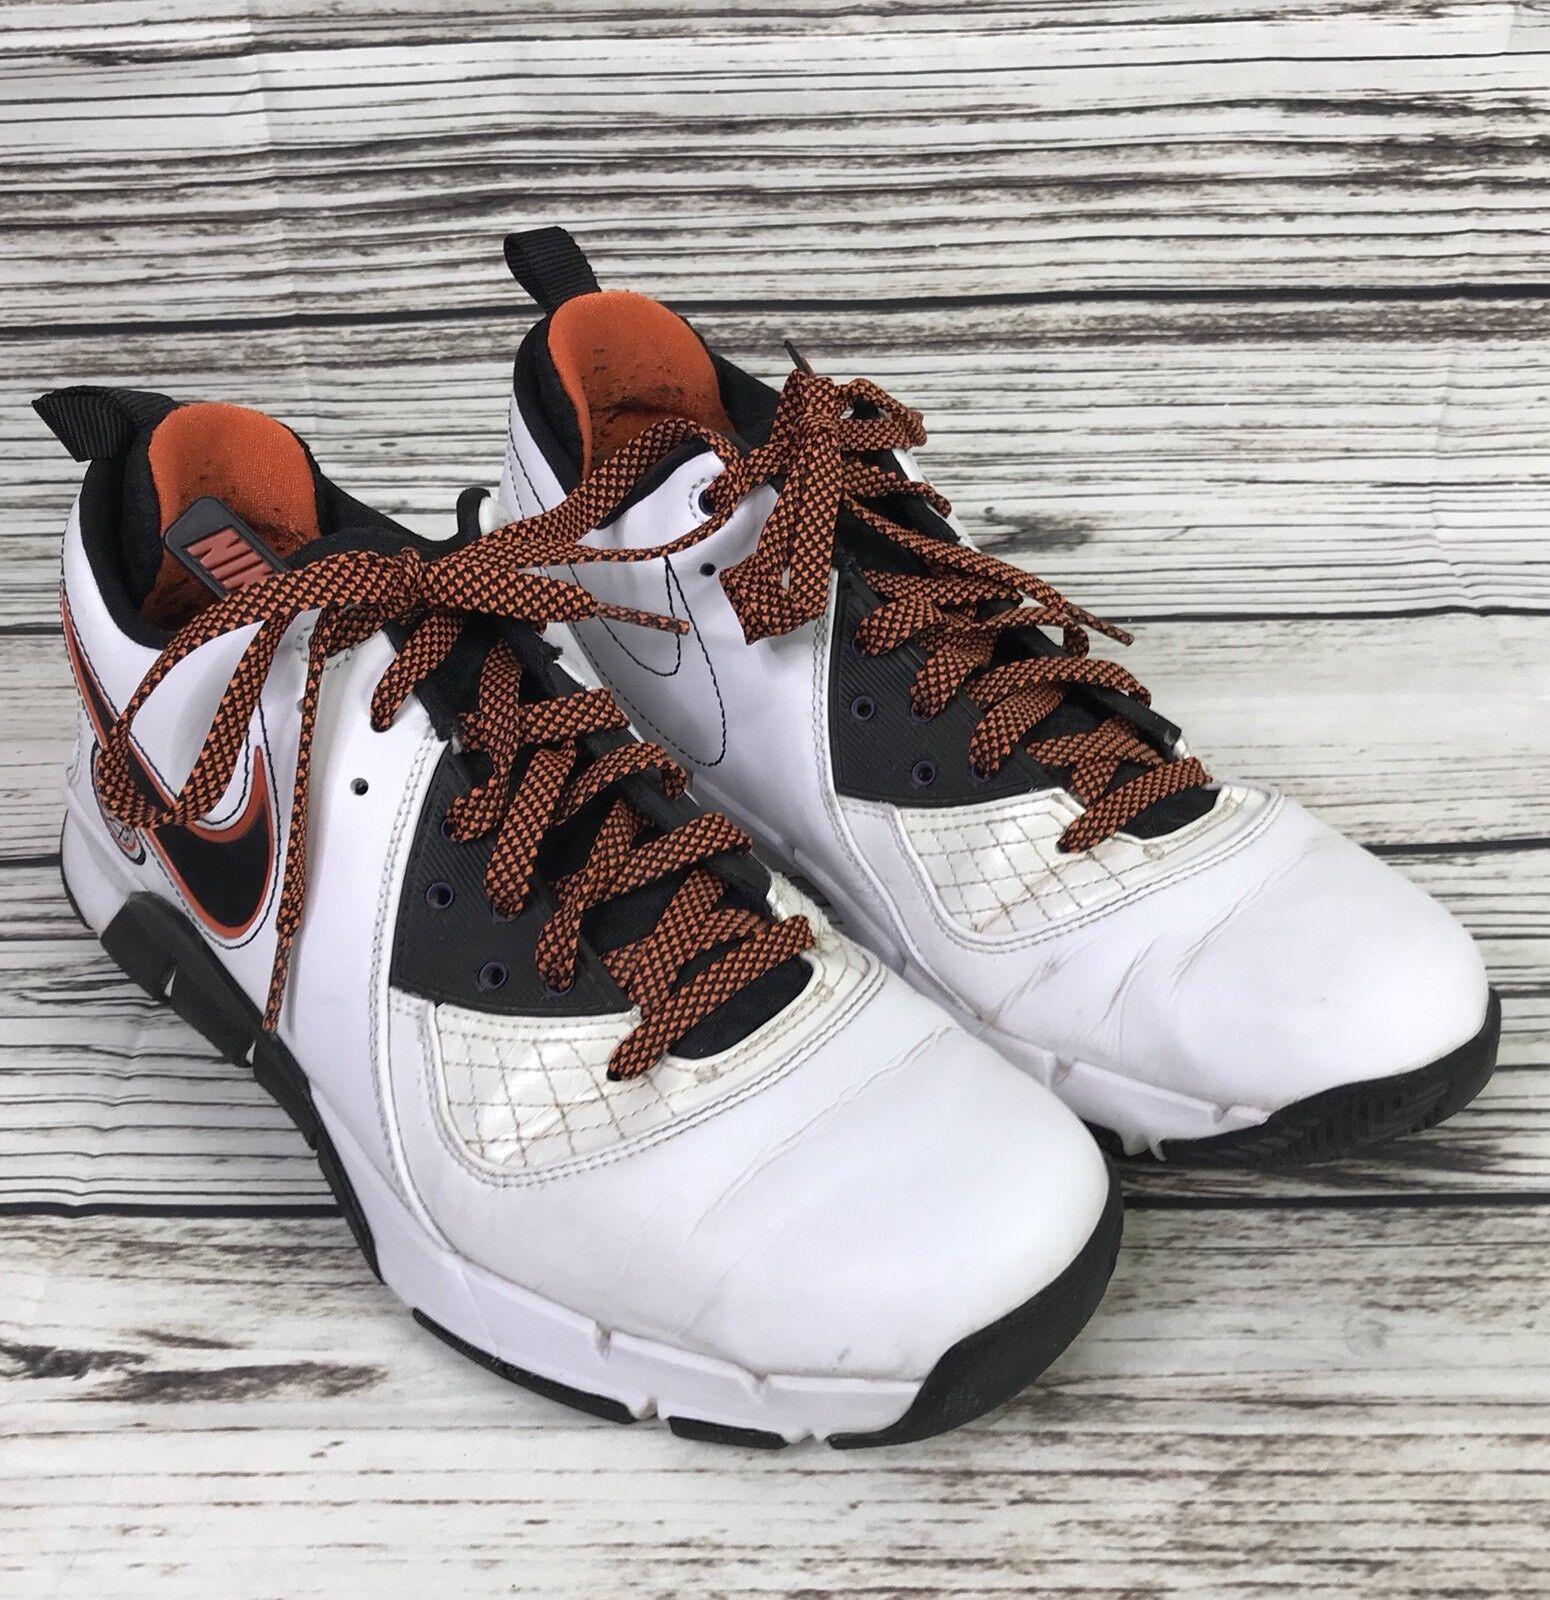 Nike zoom - mvp-steve nash pop - edition orange Weiß schwarz orange edition blaze 354189-101 schuhe b0ba56